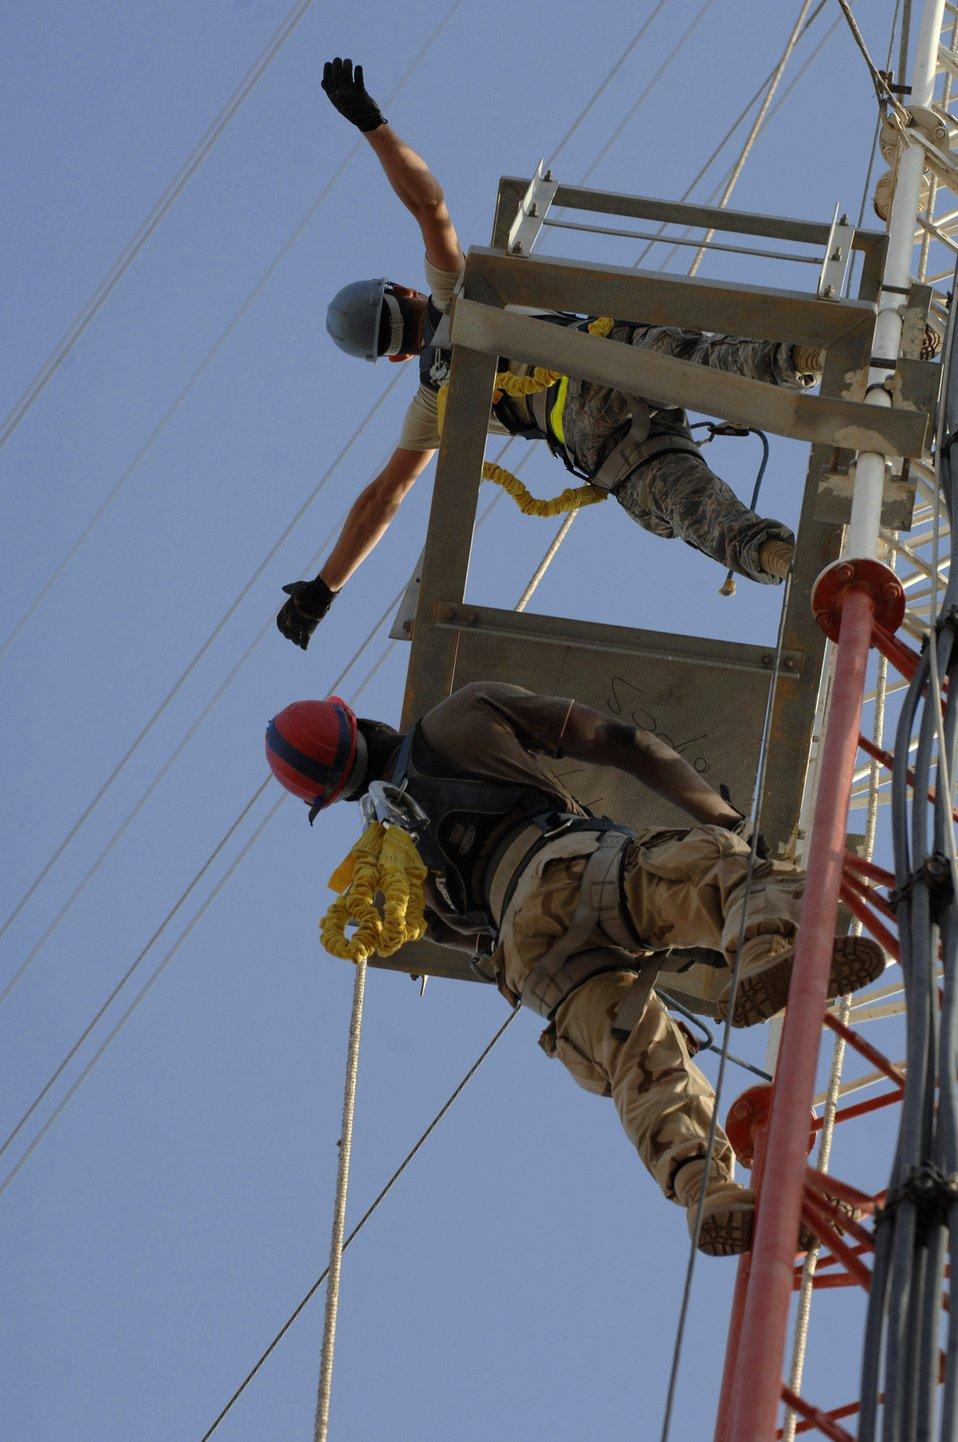 Tower-climbing certification